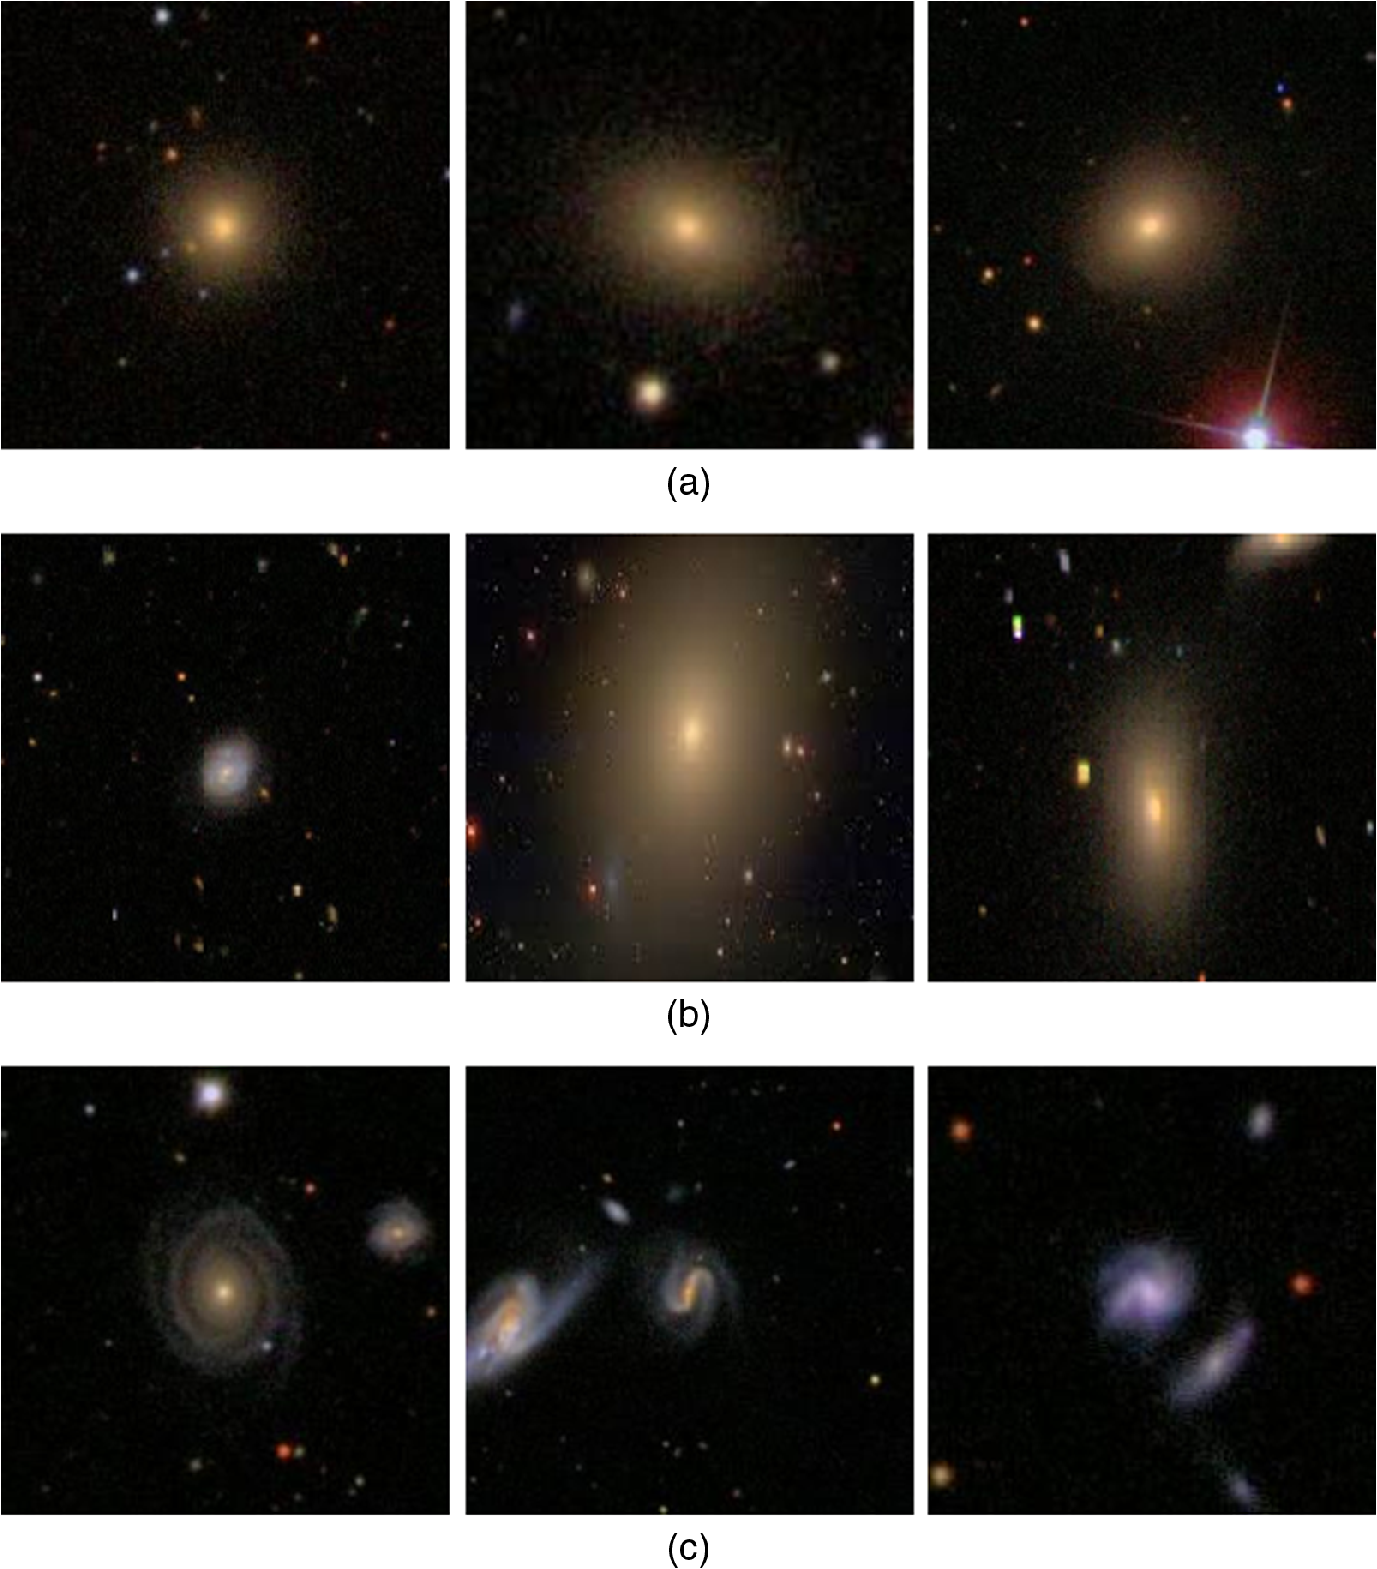 Galaxy images classification using hybrid brain storm optimization